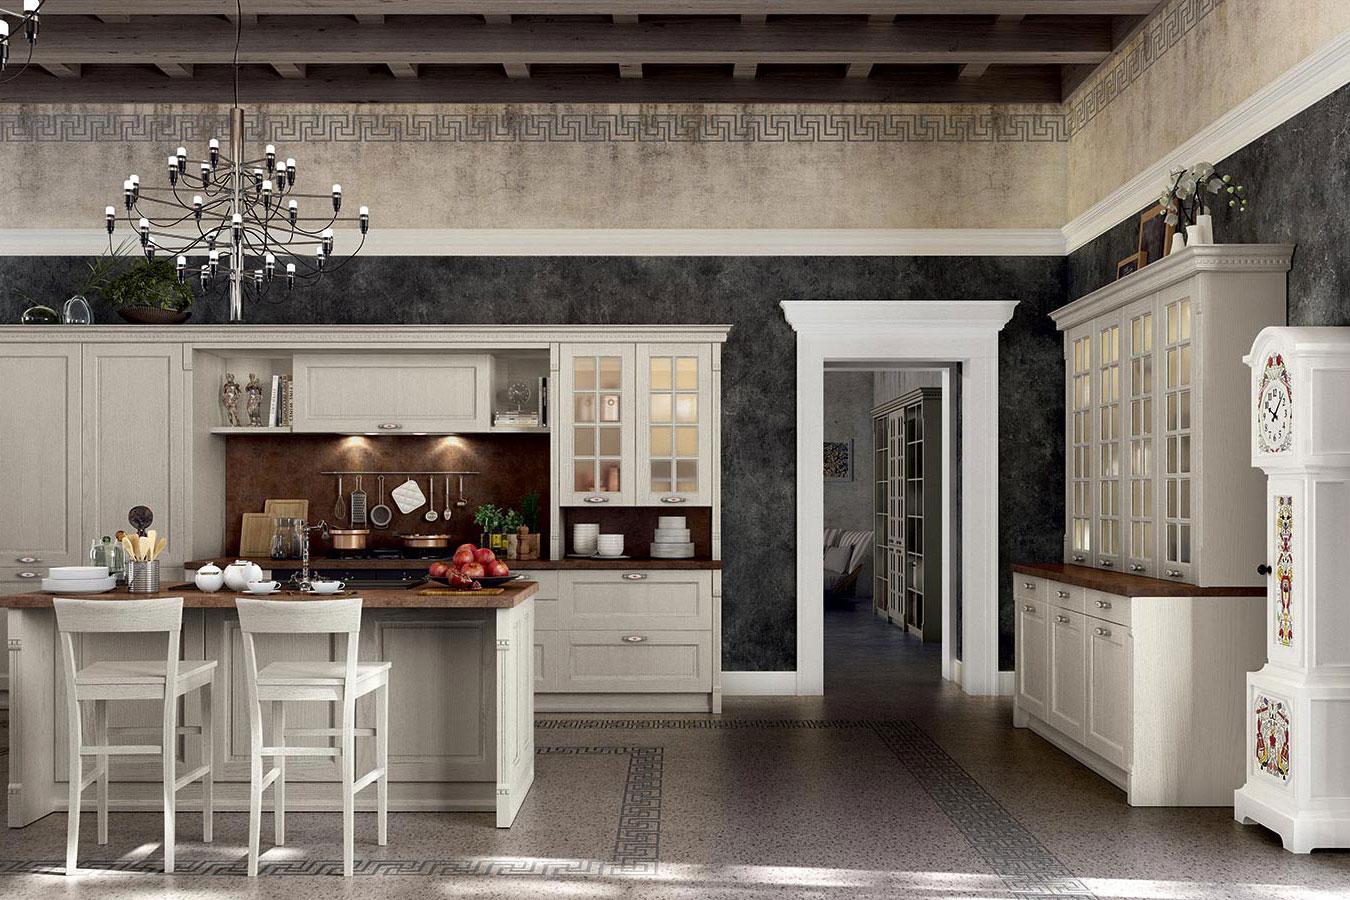 Cucina classica Virginia di Arredo3 da righetti mobili a Novara Piemonte